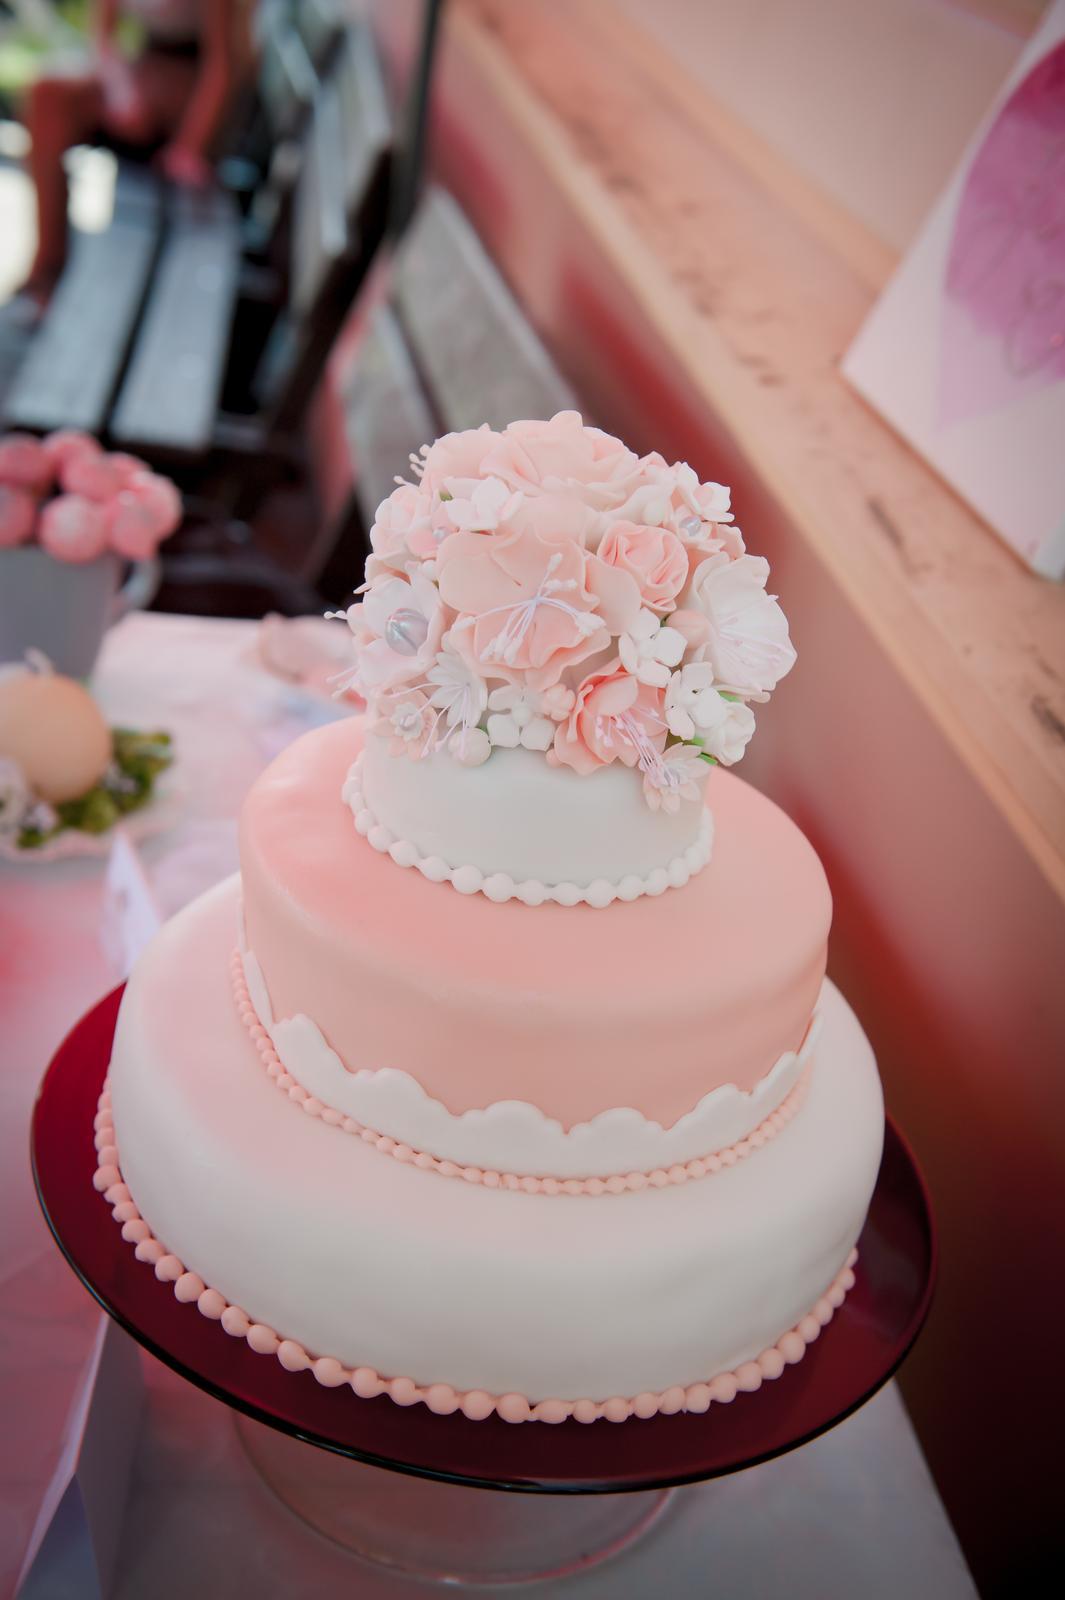 Pavla{{_AND_}}Honza - náš krásný dortík od mé milované sestřičky ♥